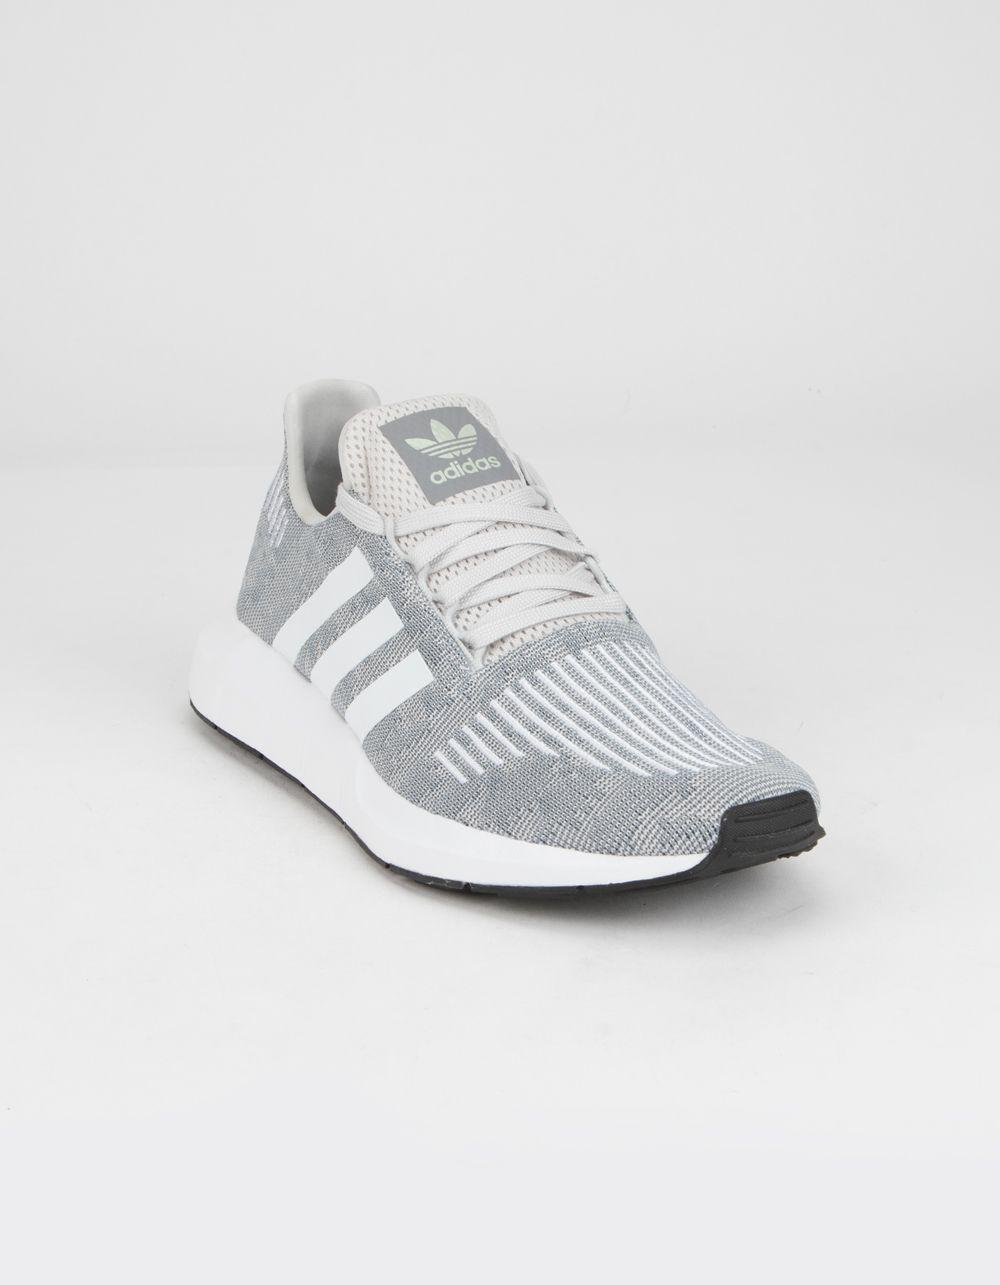 Sudamerica Cromático Menagerry  ADIDAS Swift Run Gray & White Shoes - GRAY - 361387115 | Adidas shoes  women, Grey tennis shoes, Addidas shoes women